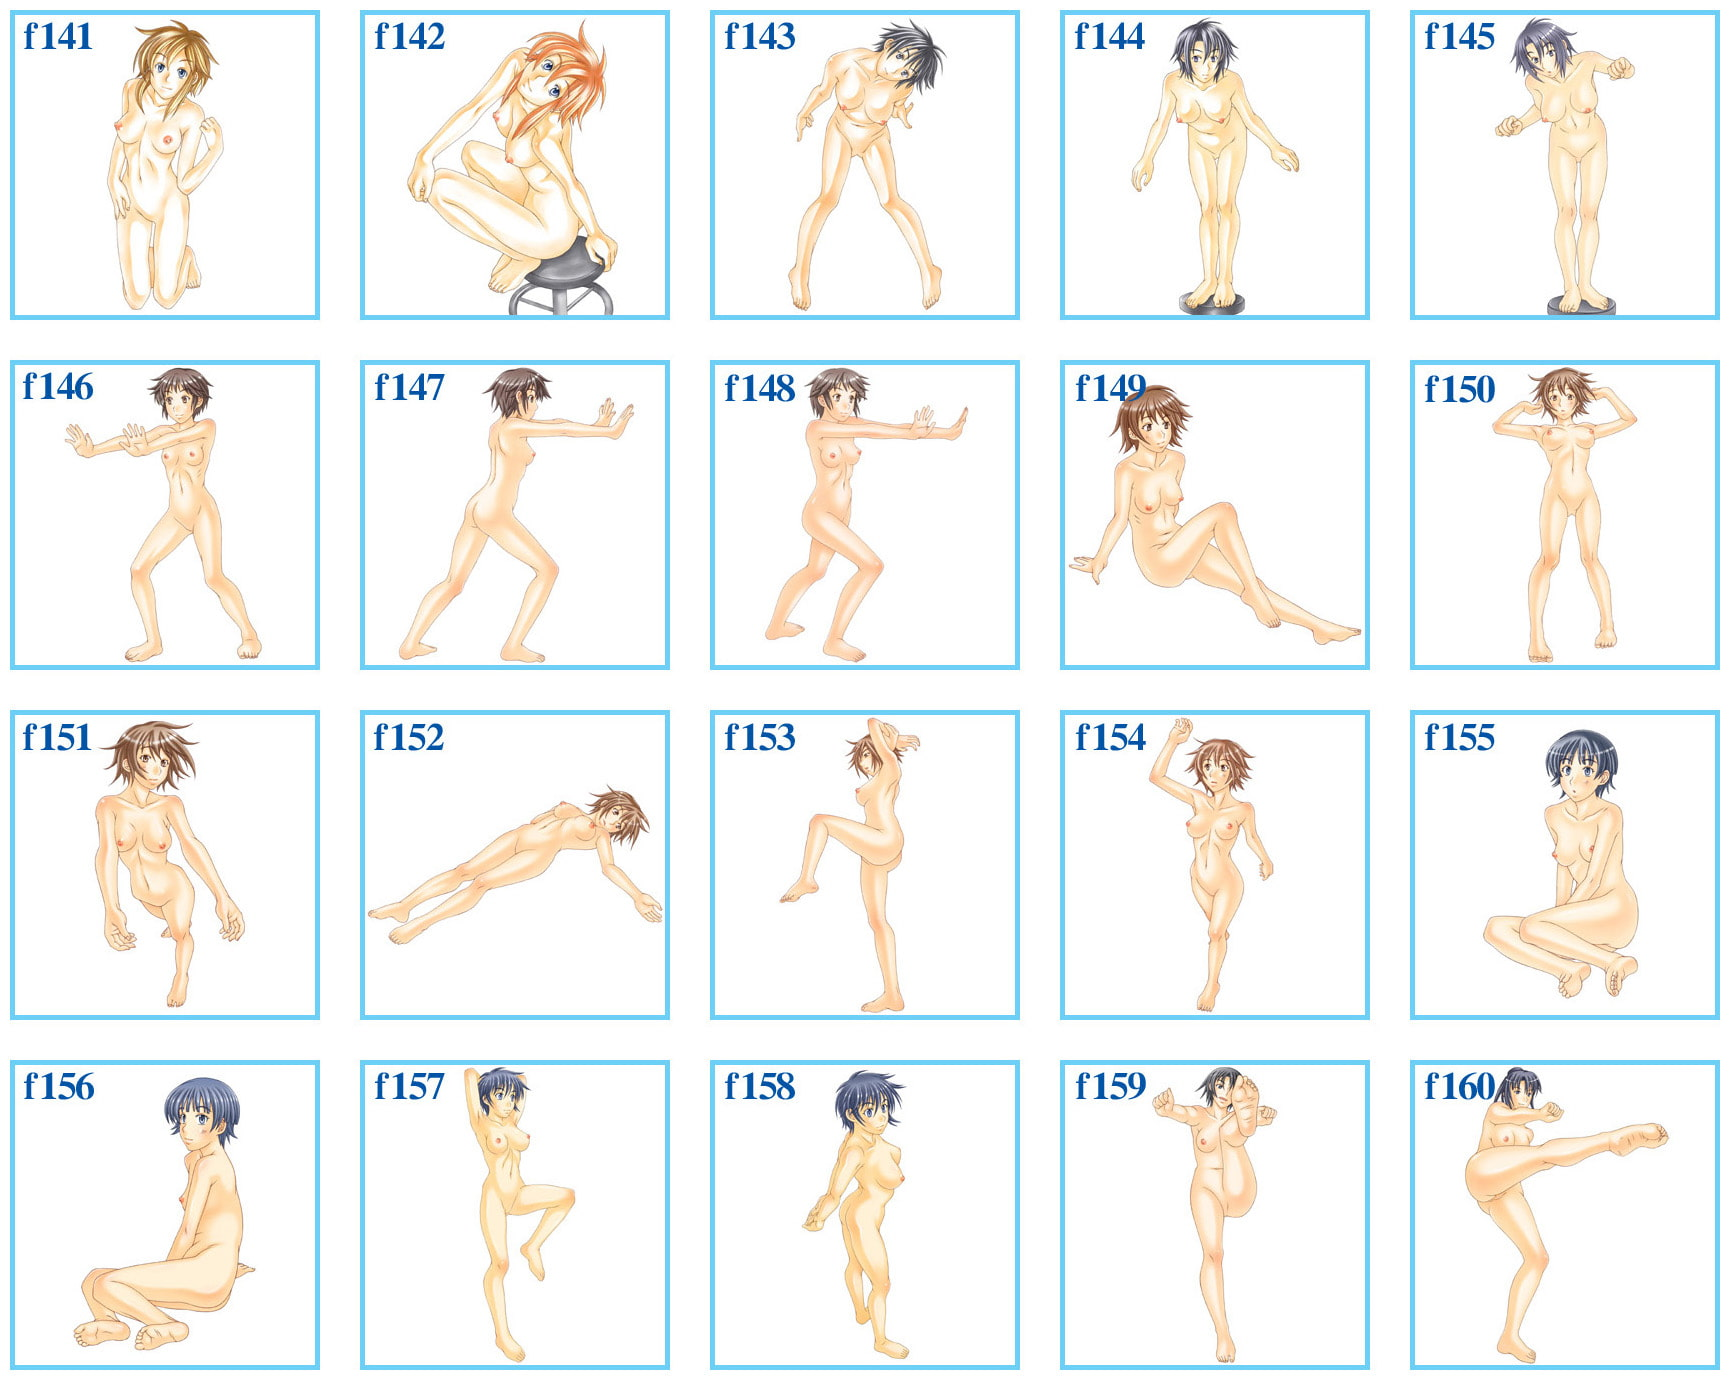 RJ317290 裸婦イラストポーズ集 vol.08 [20210211]